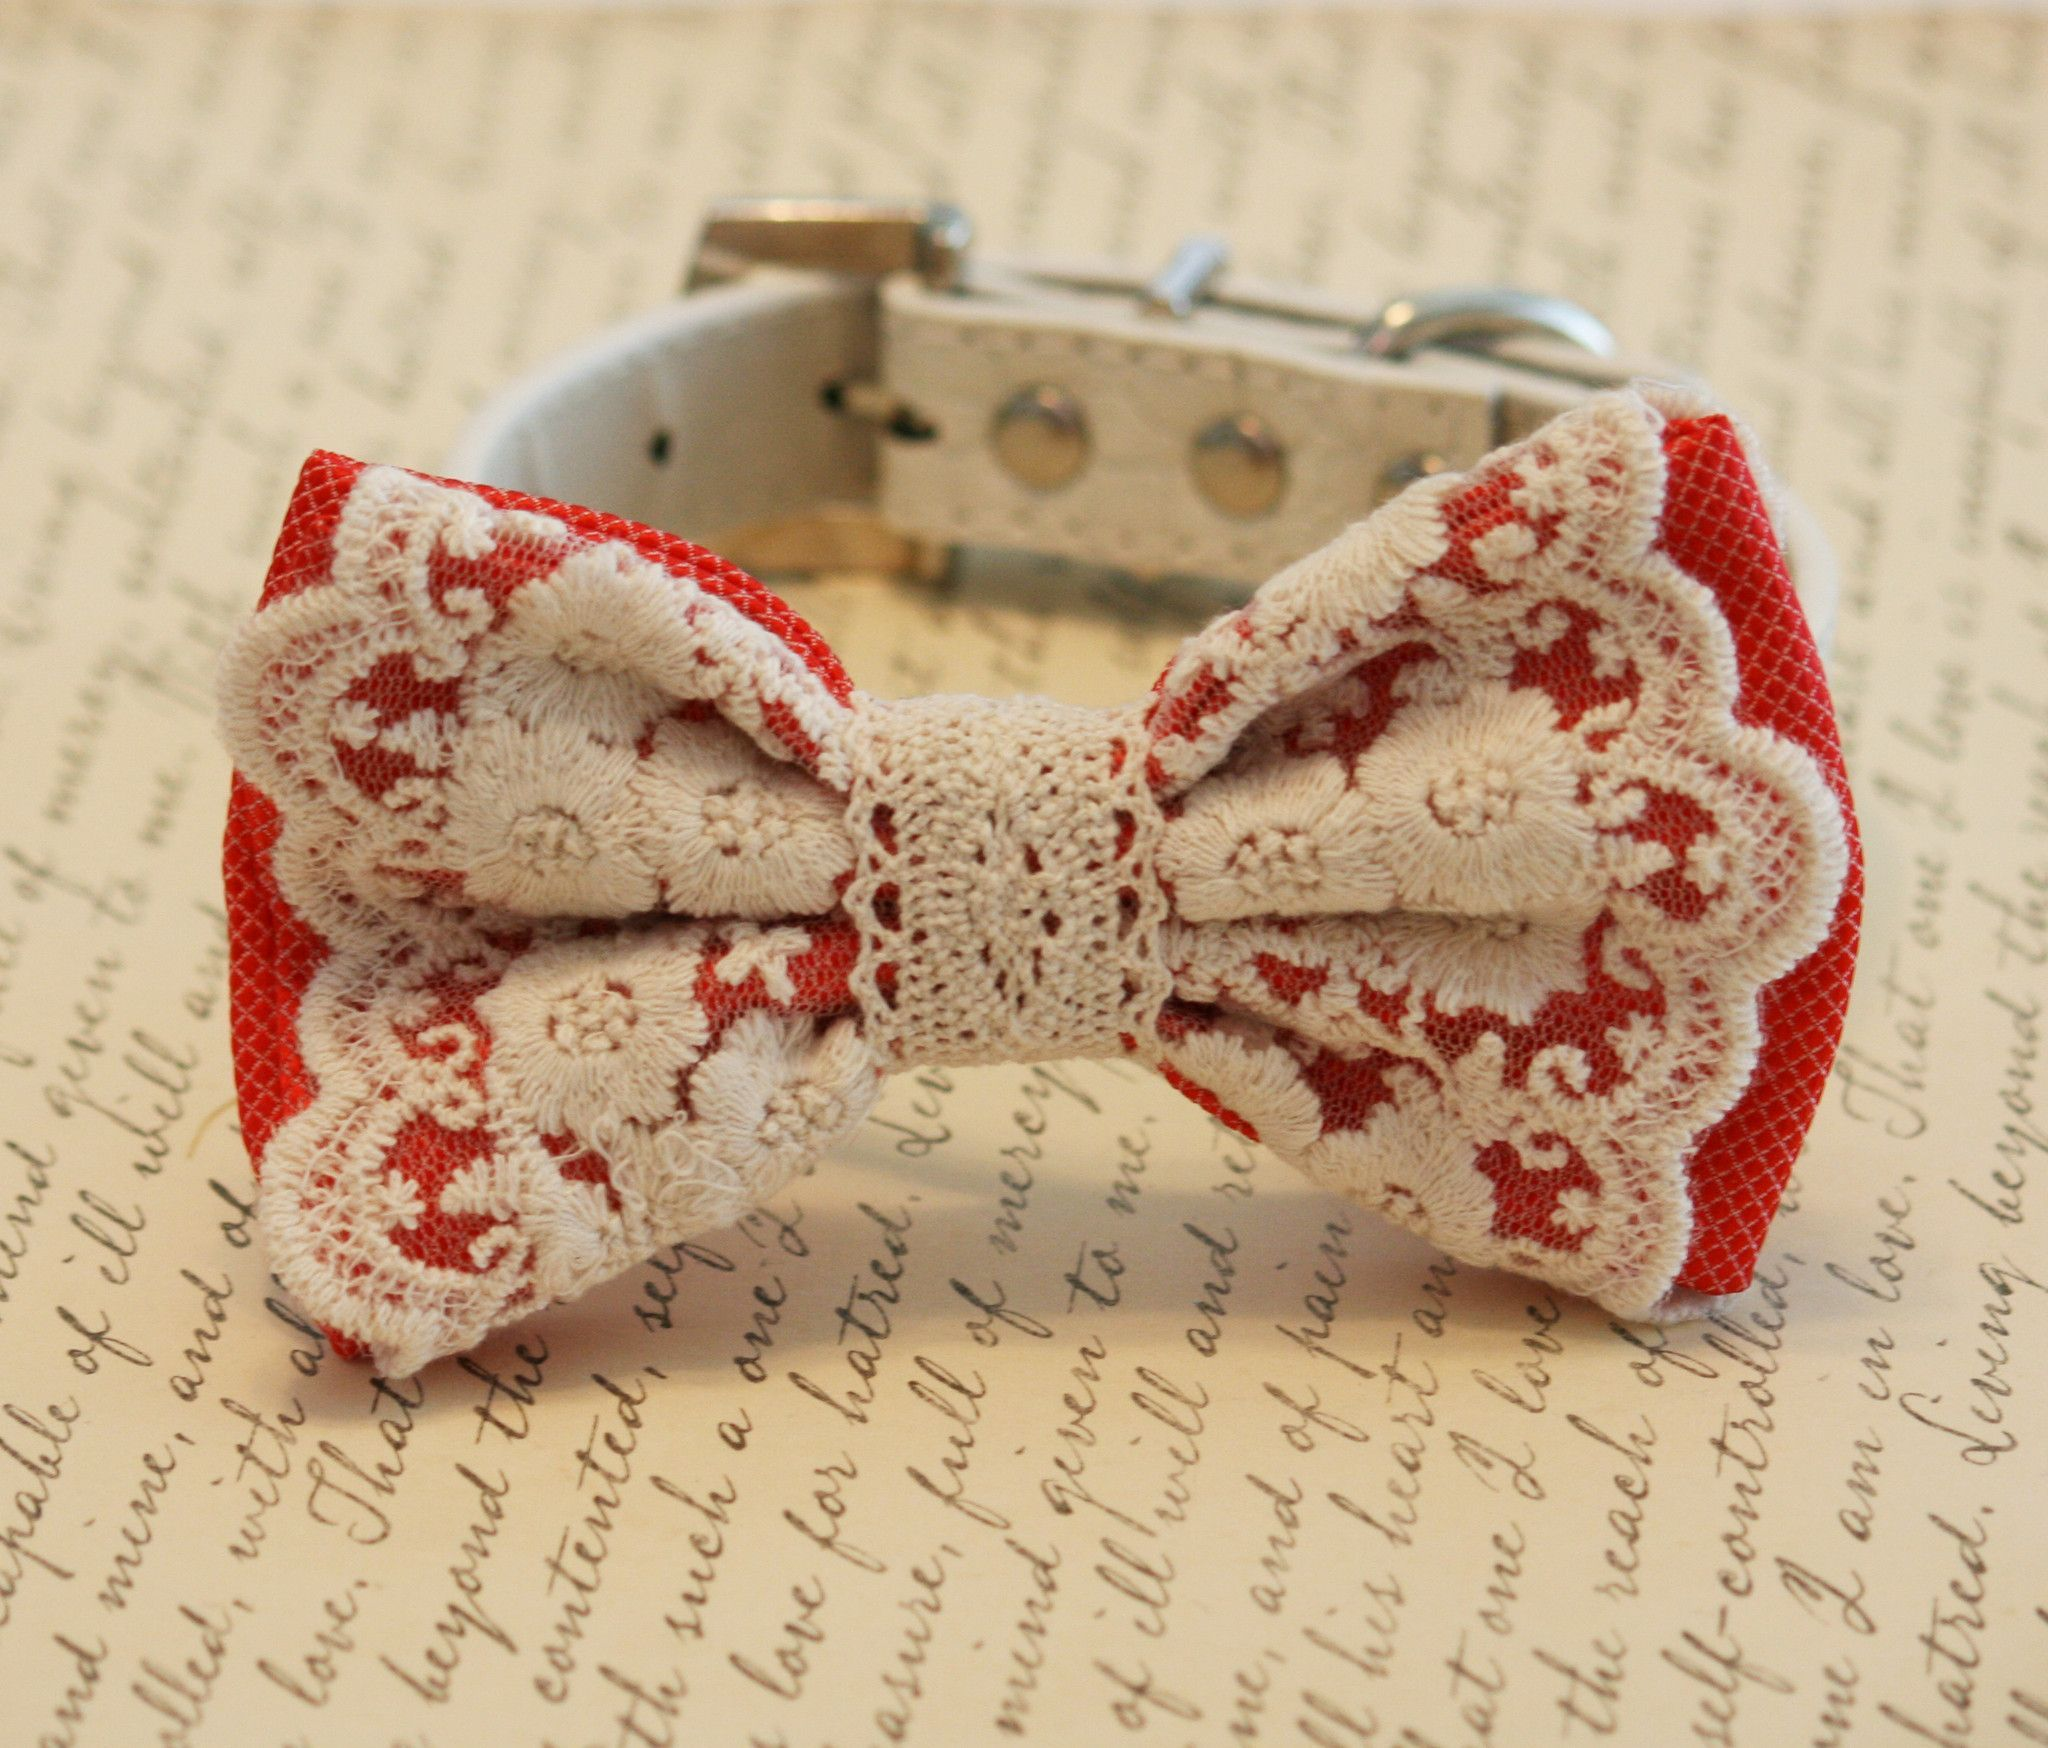 Coral wedding dog collar, Coral Lace Dog Bow Tie, Pet Wedding accessory, Vintage wedding, beach wedding, country wedding, Dog Lovers